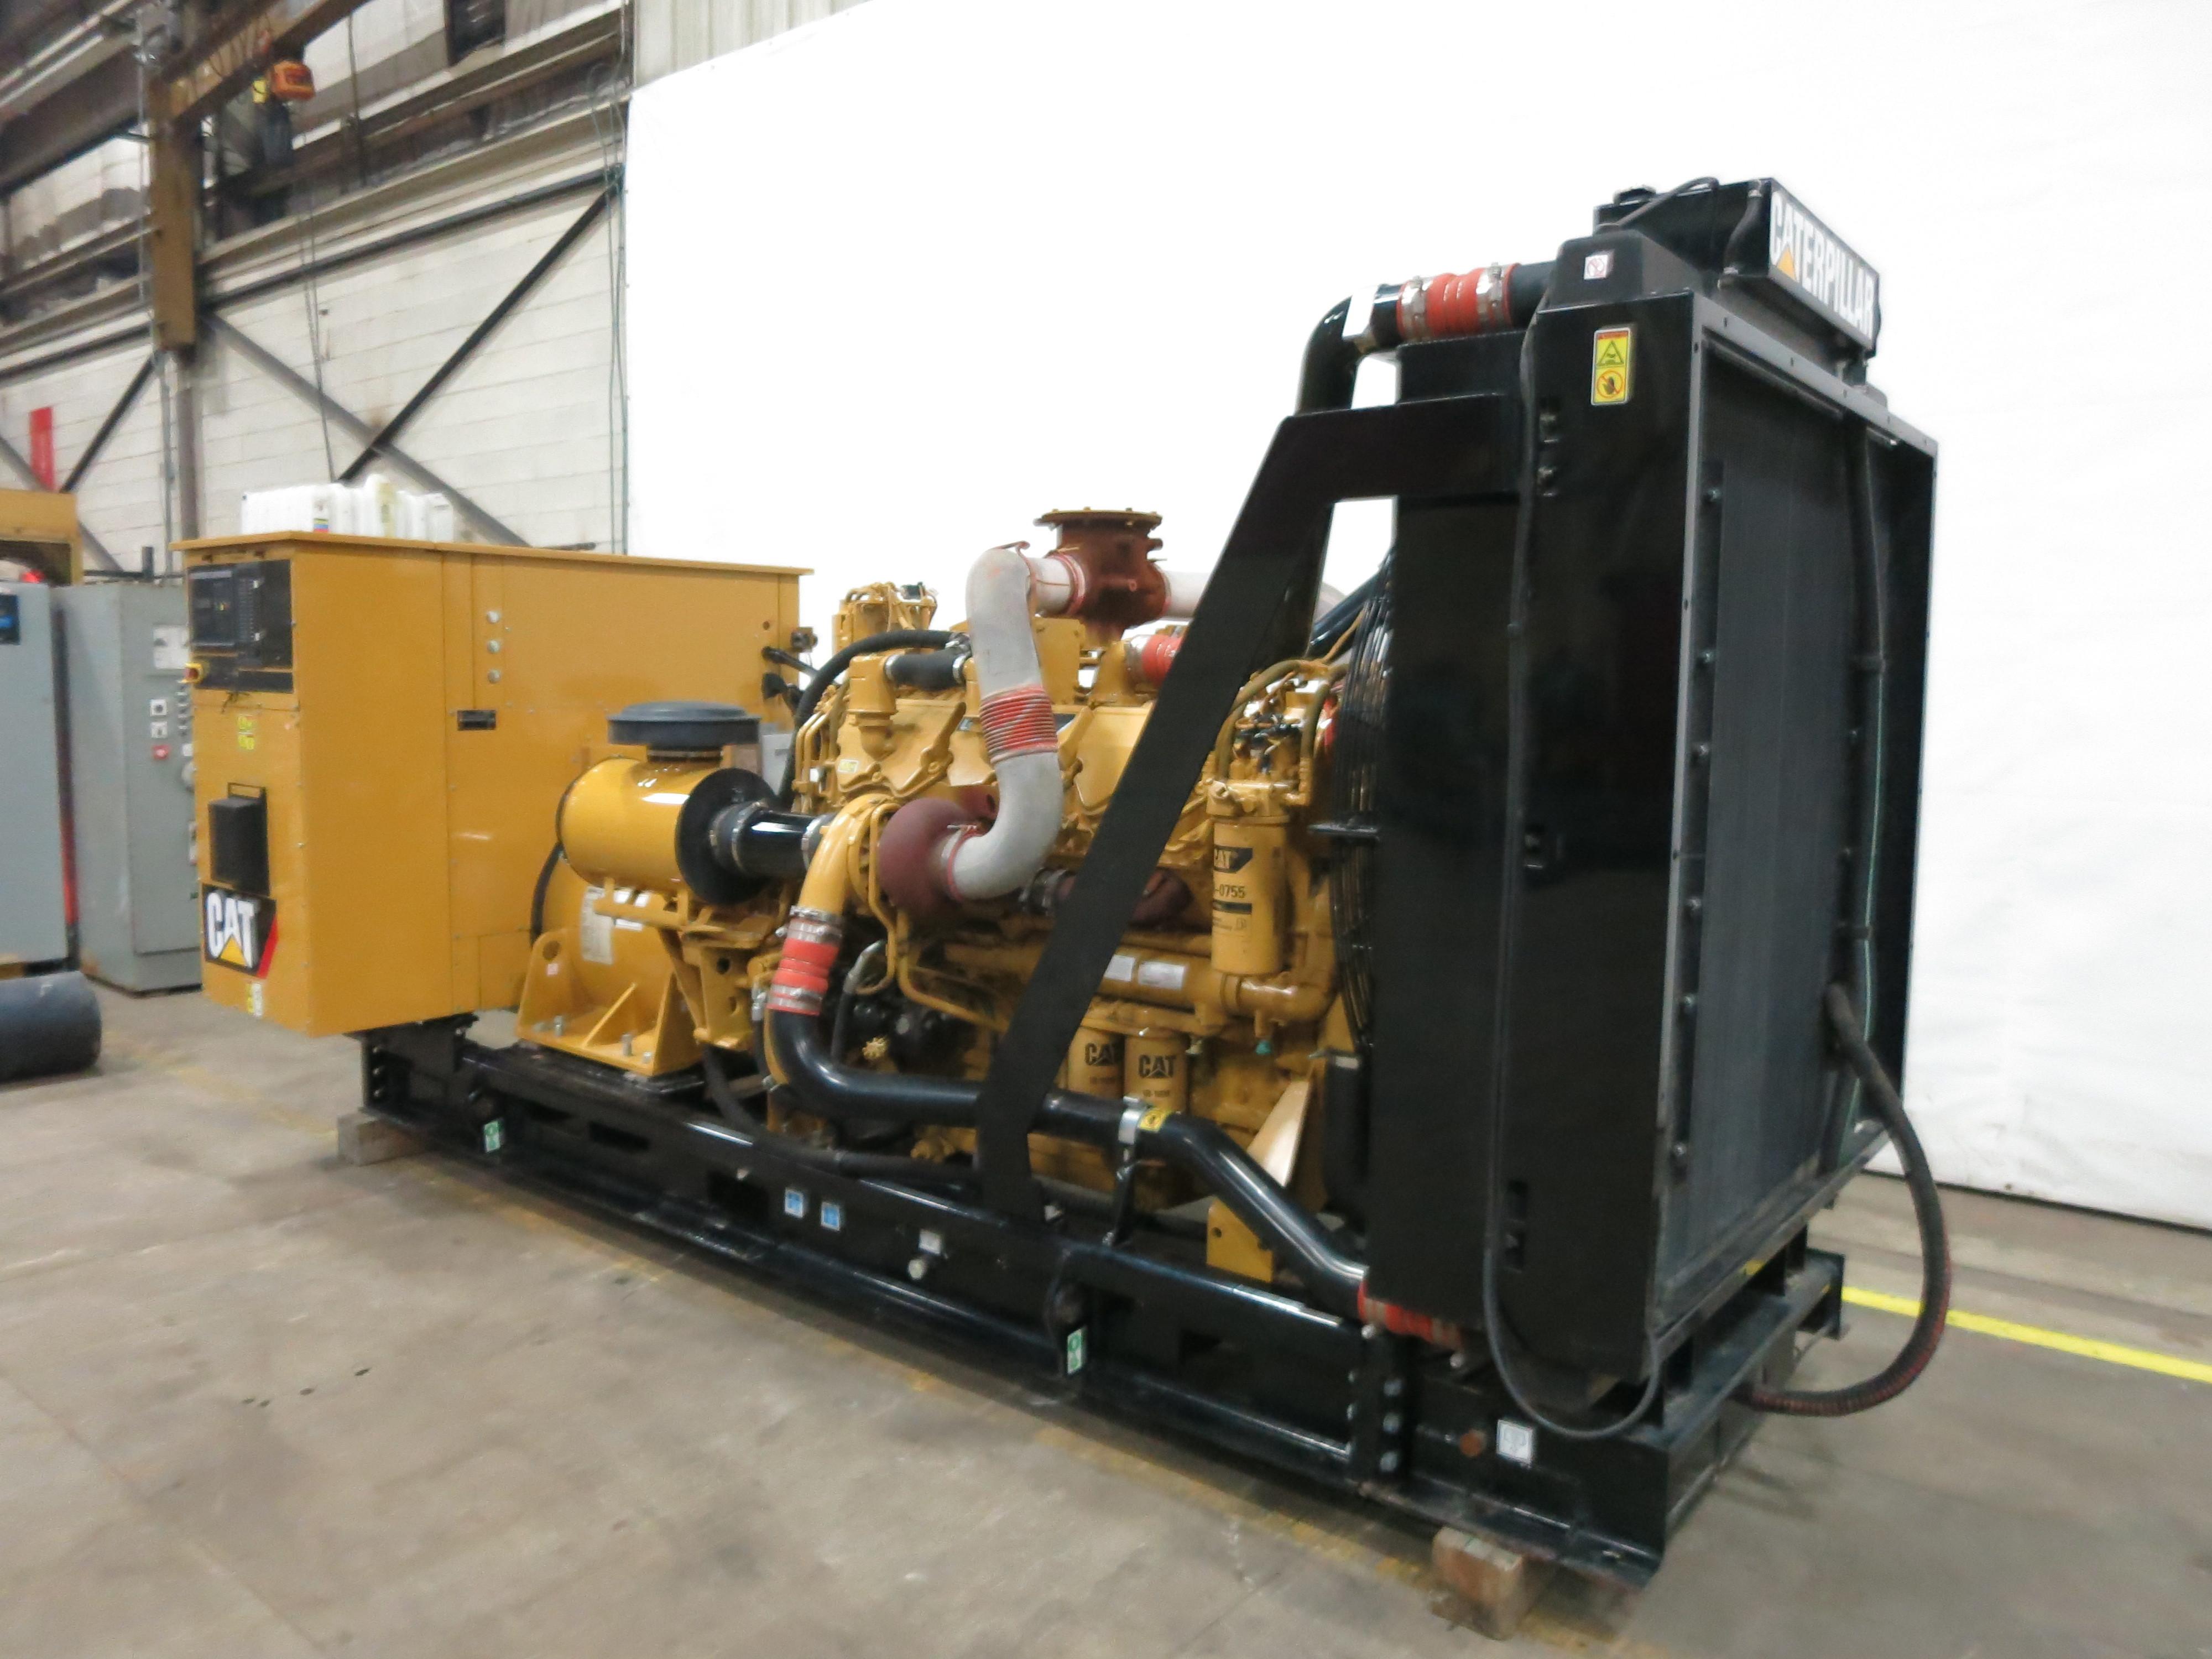 Used Caterpillar C27 Diesel Generator 361 Hrs